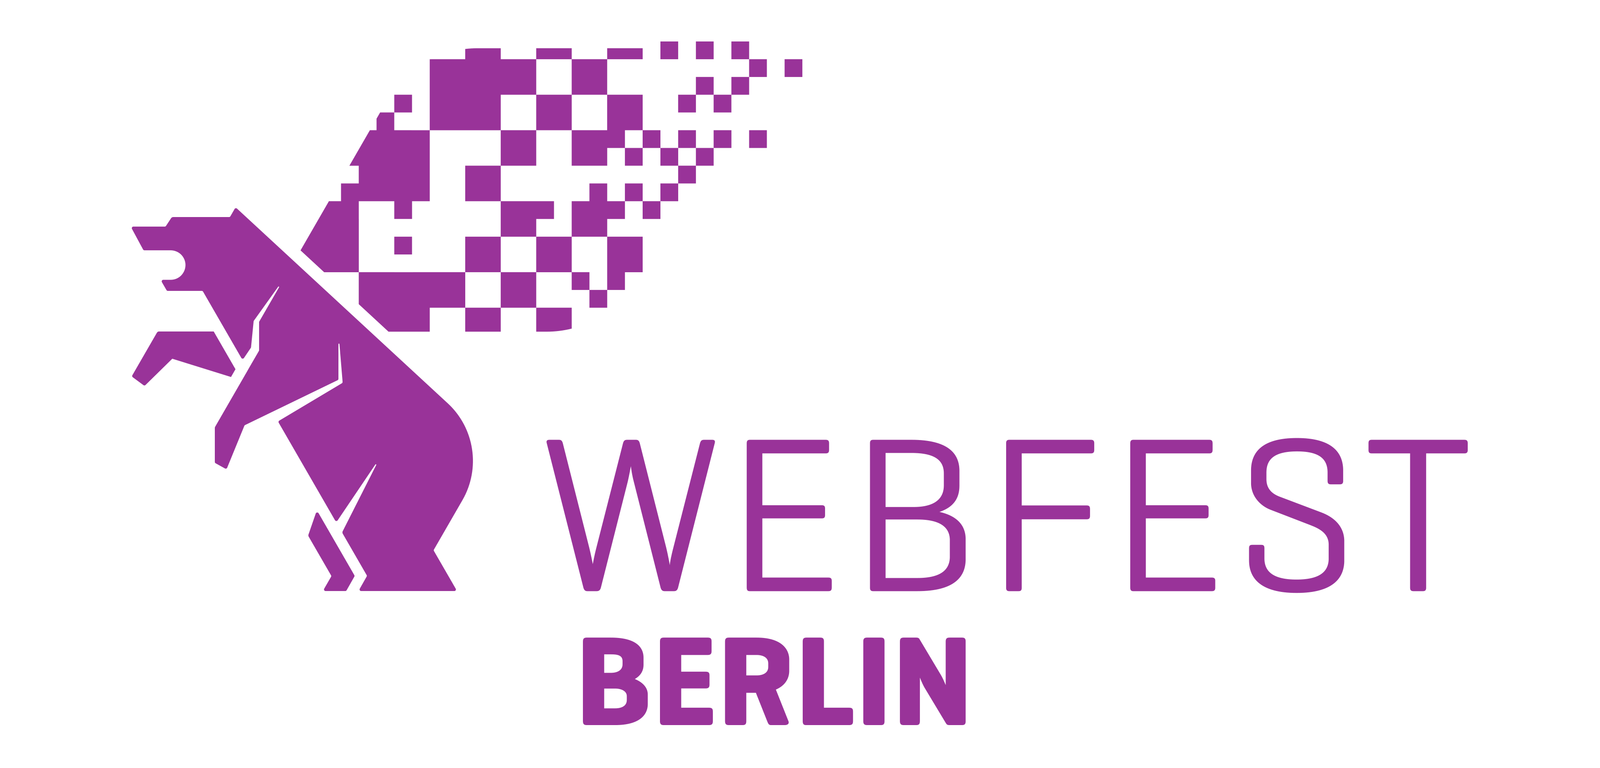 berlin_logo_purple_symbol_left